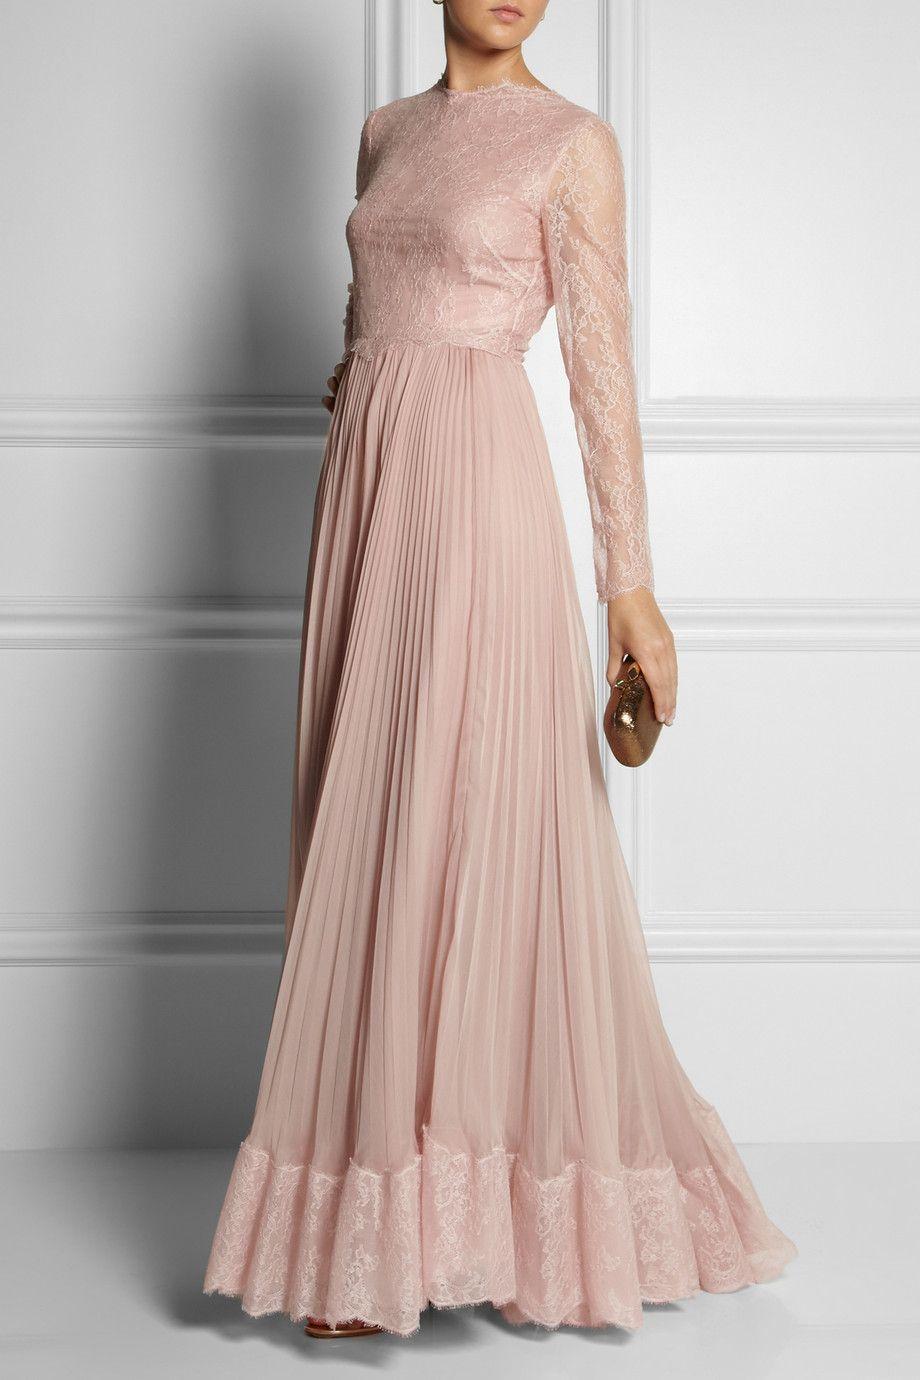 Valentino | encaje y seda vestido | NET-A-PORTER.COM | VAMOS DE ...